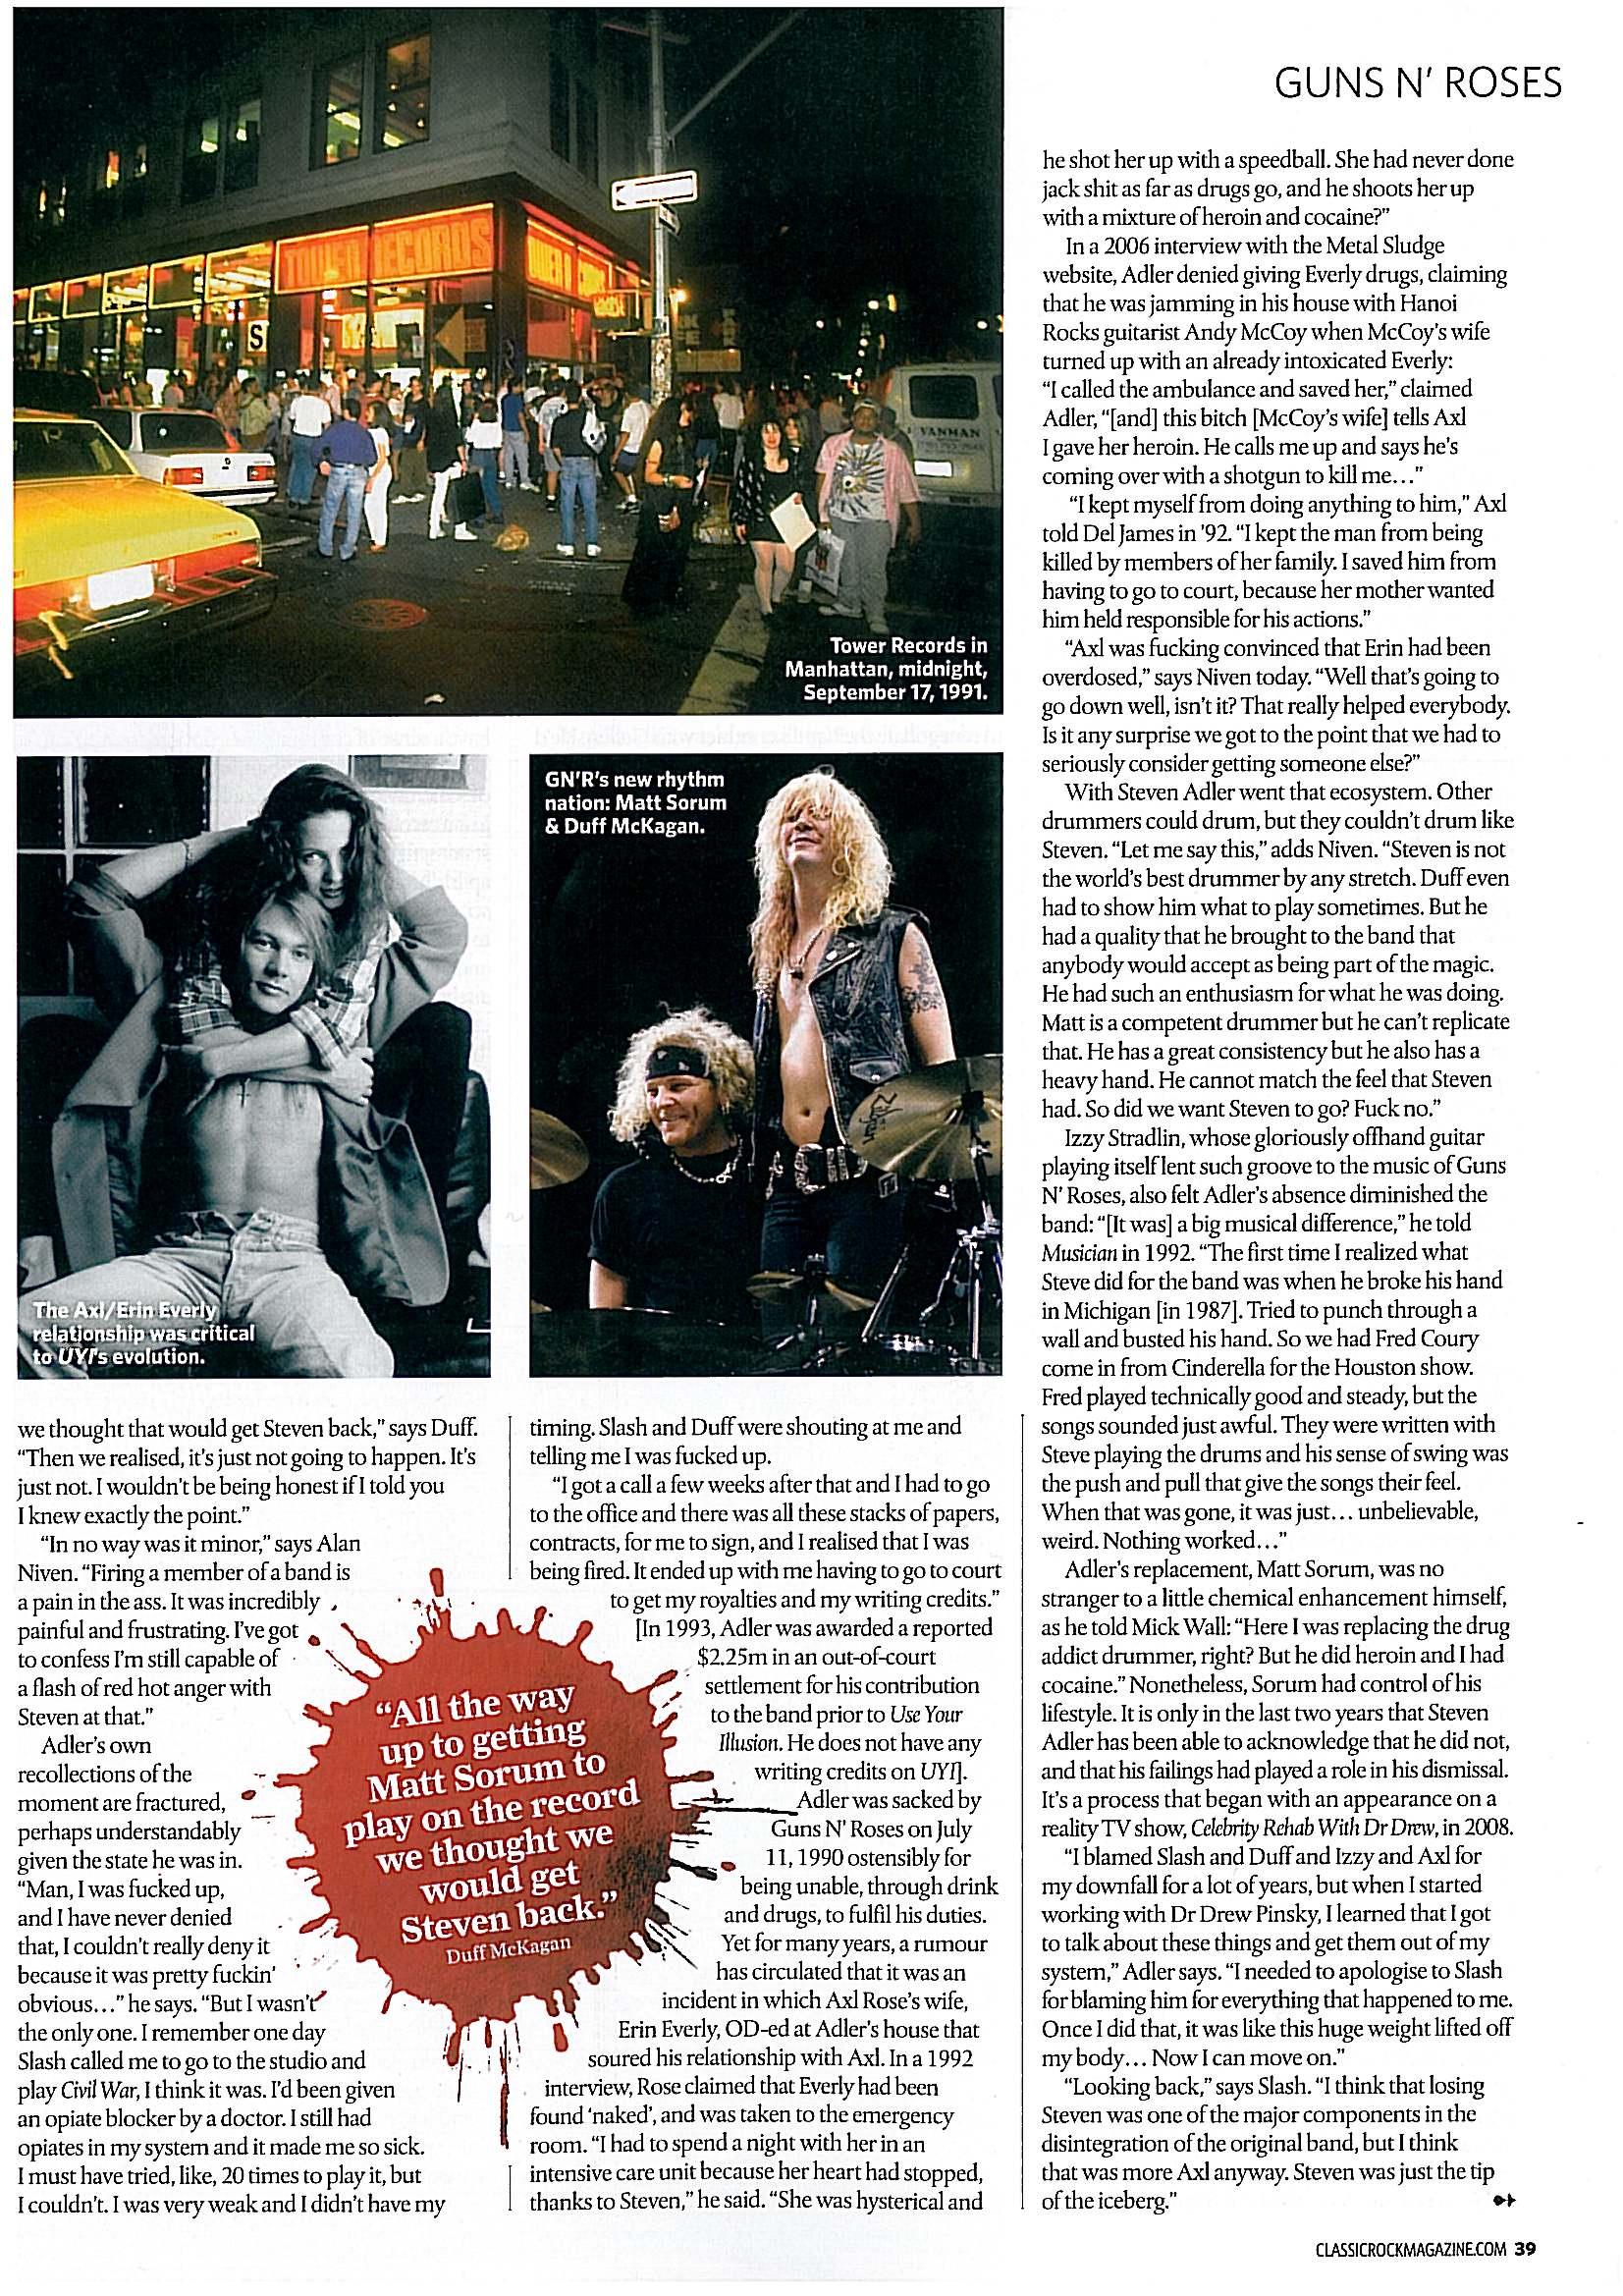 2011.06.DD - Classic Rock Magazine - Behind Use Your Illusion WWA99nv2_o